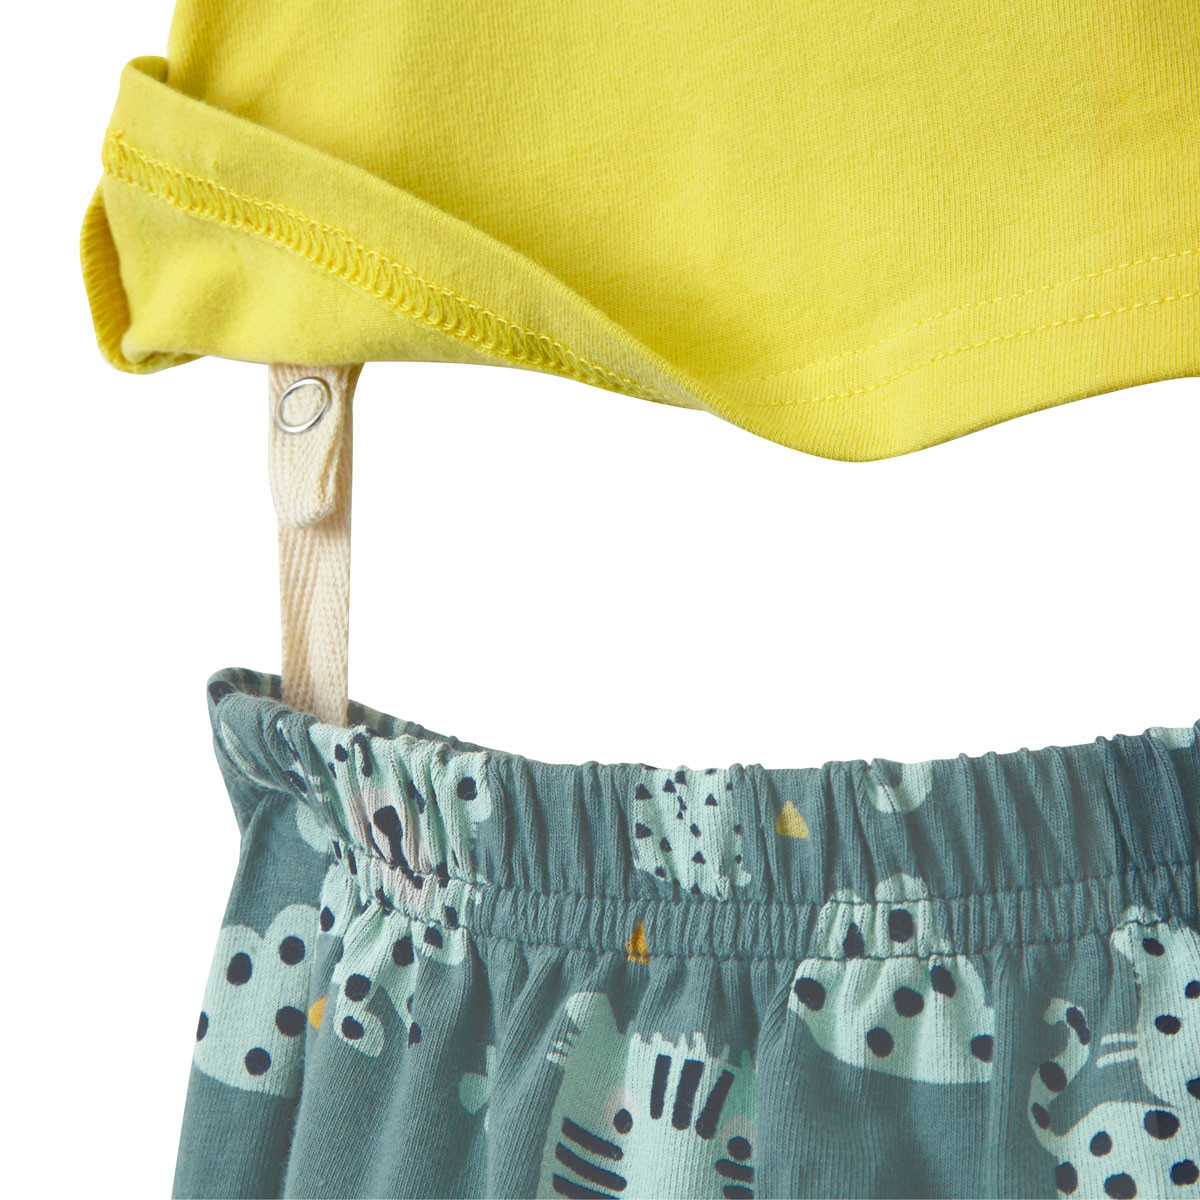 Ensemble bébé garçon t-shirt + sarouel Jumbe système d'attache tee-shirt pantalon